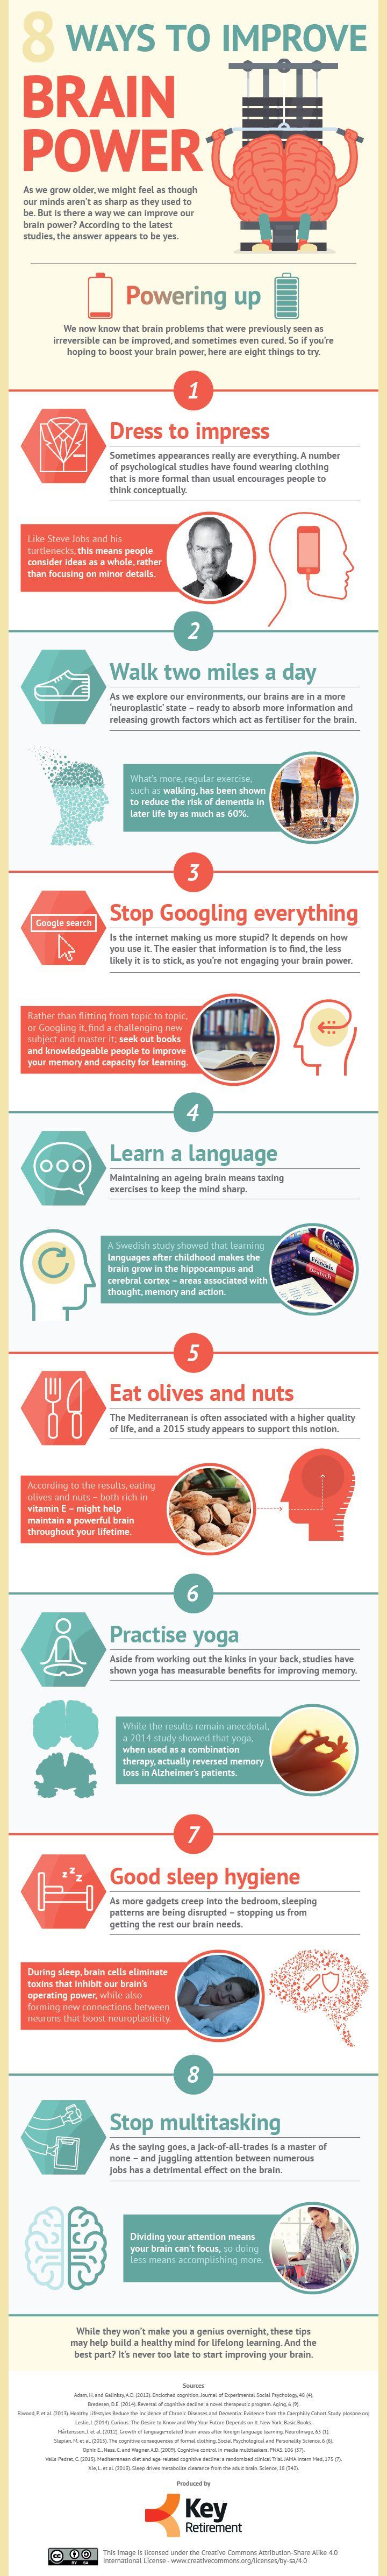 Infographic: Eight Ways To Improve Brain Power - DesignTAXI.com